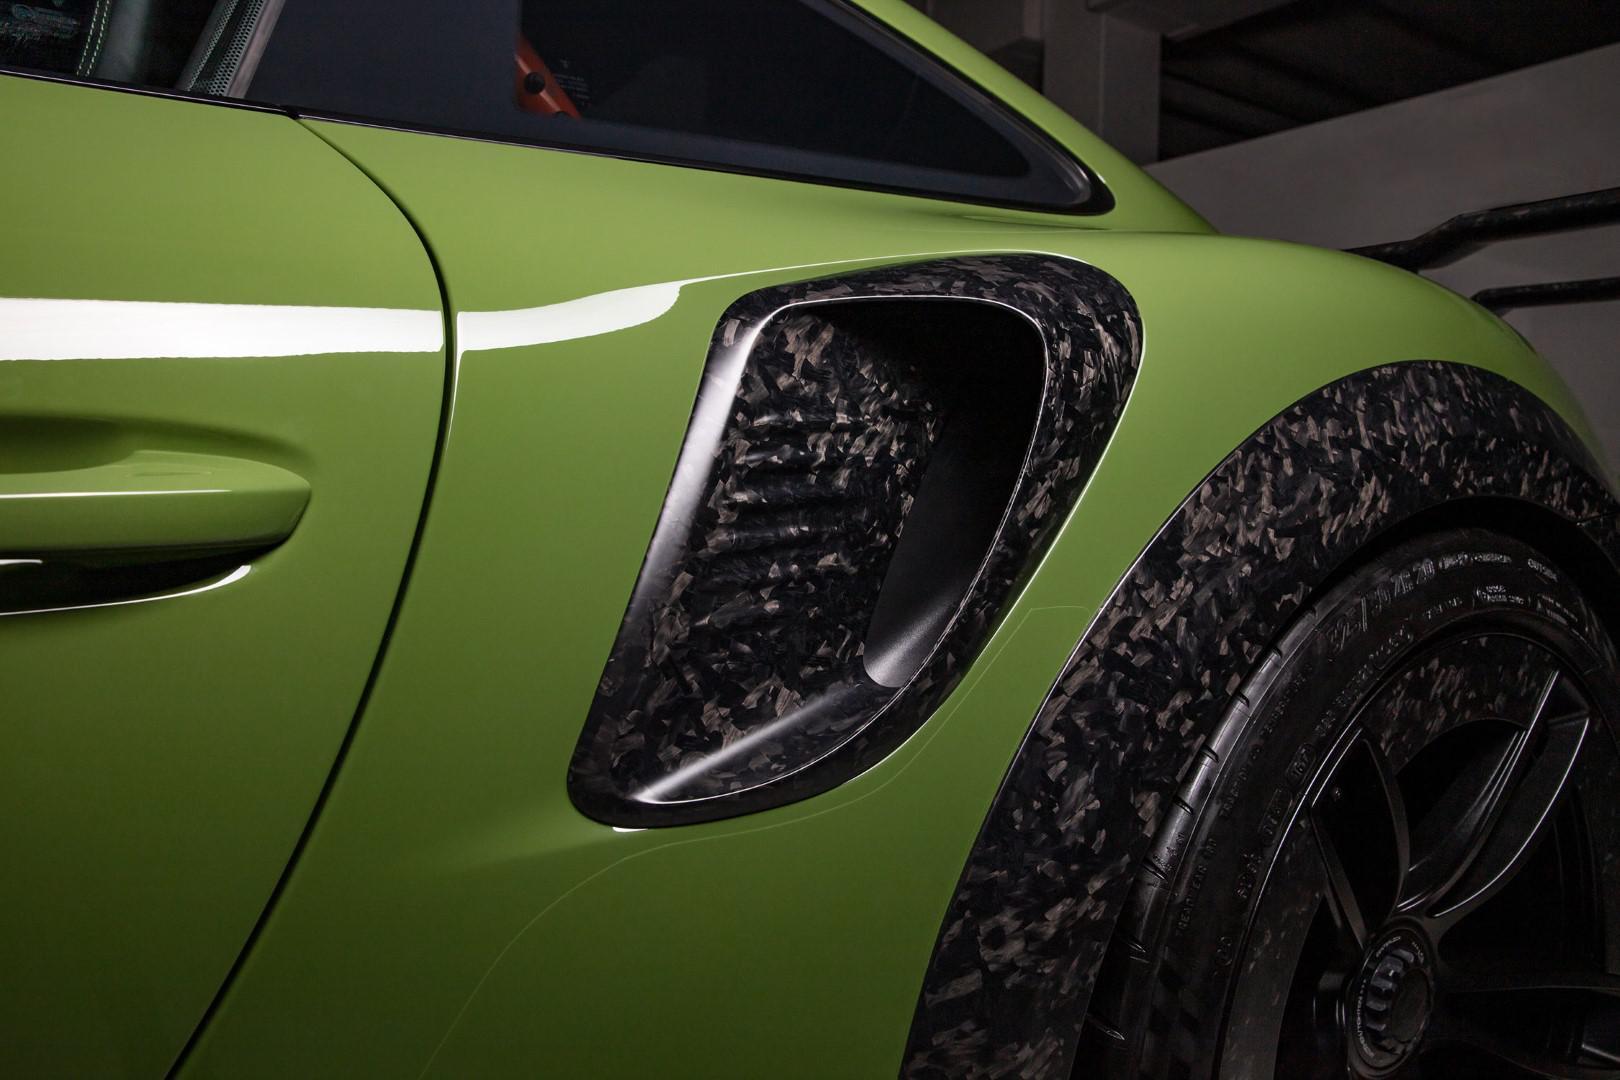 10-exemplaires-seulement-porsche-911-turbo-s-gtstreet-rs-by-techart-1049-7.jpg